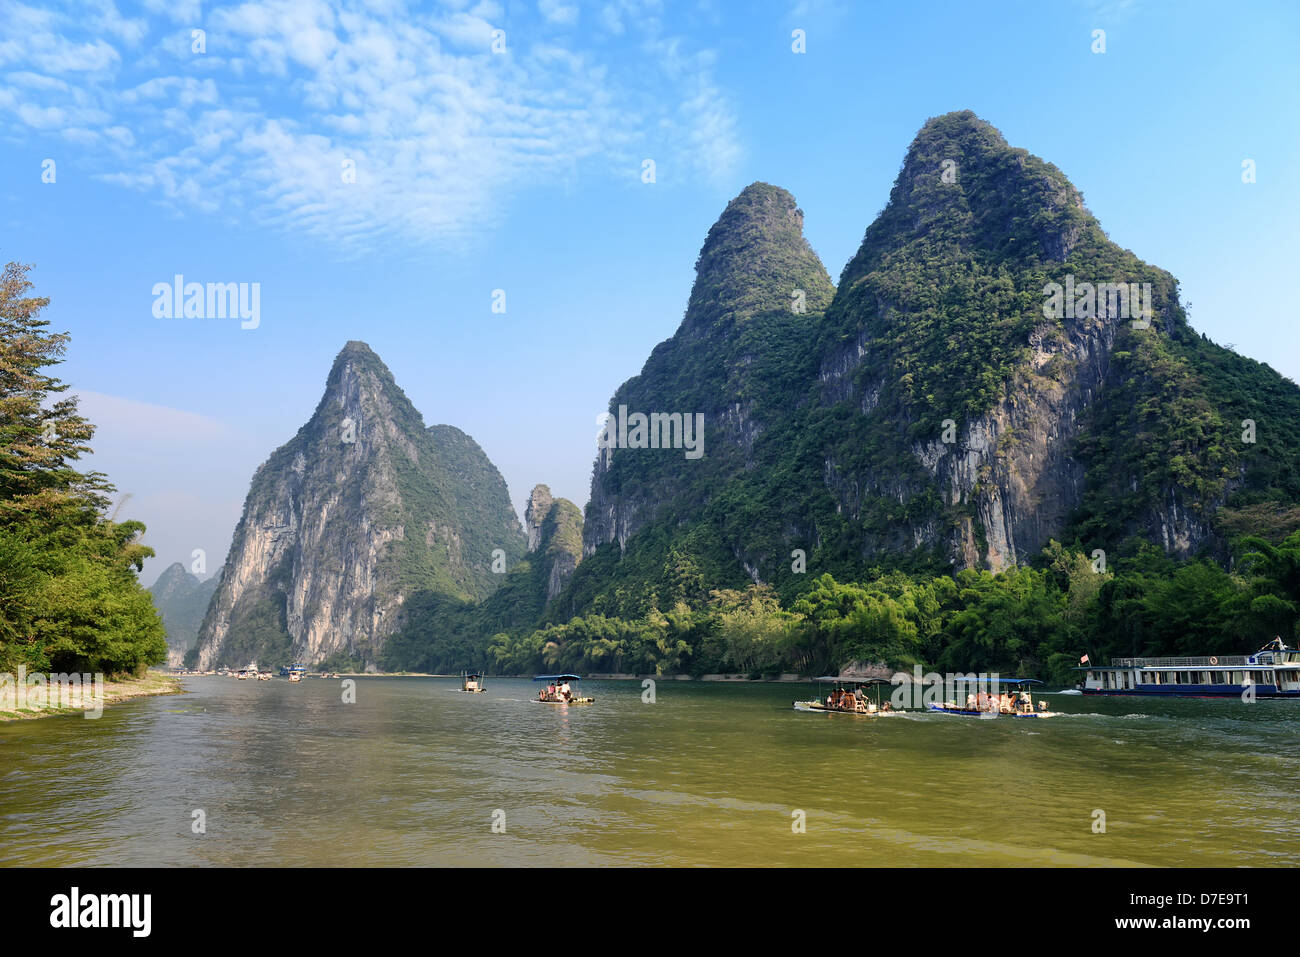 Bamboo raft at the Ulong river near Yangshuo, Guanxi province, China Stock Photo